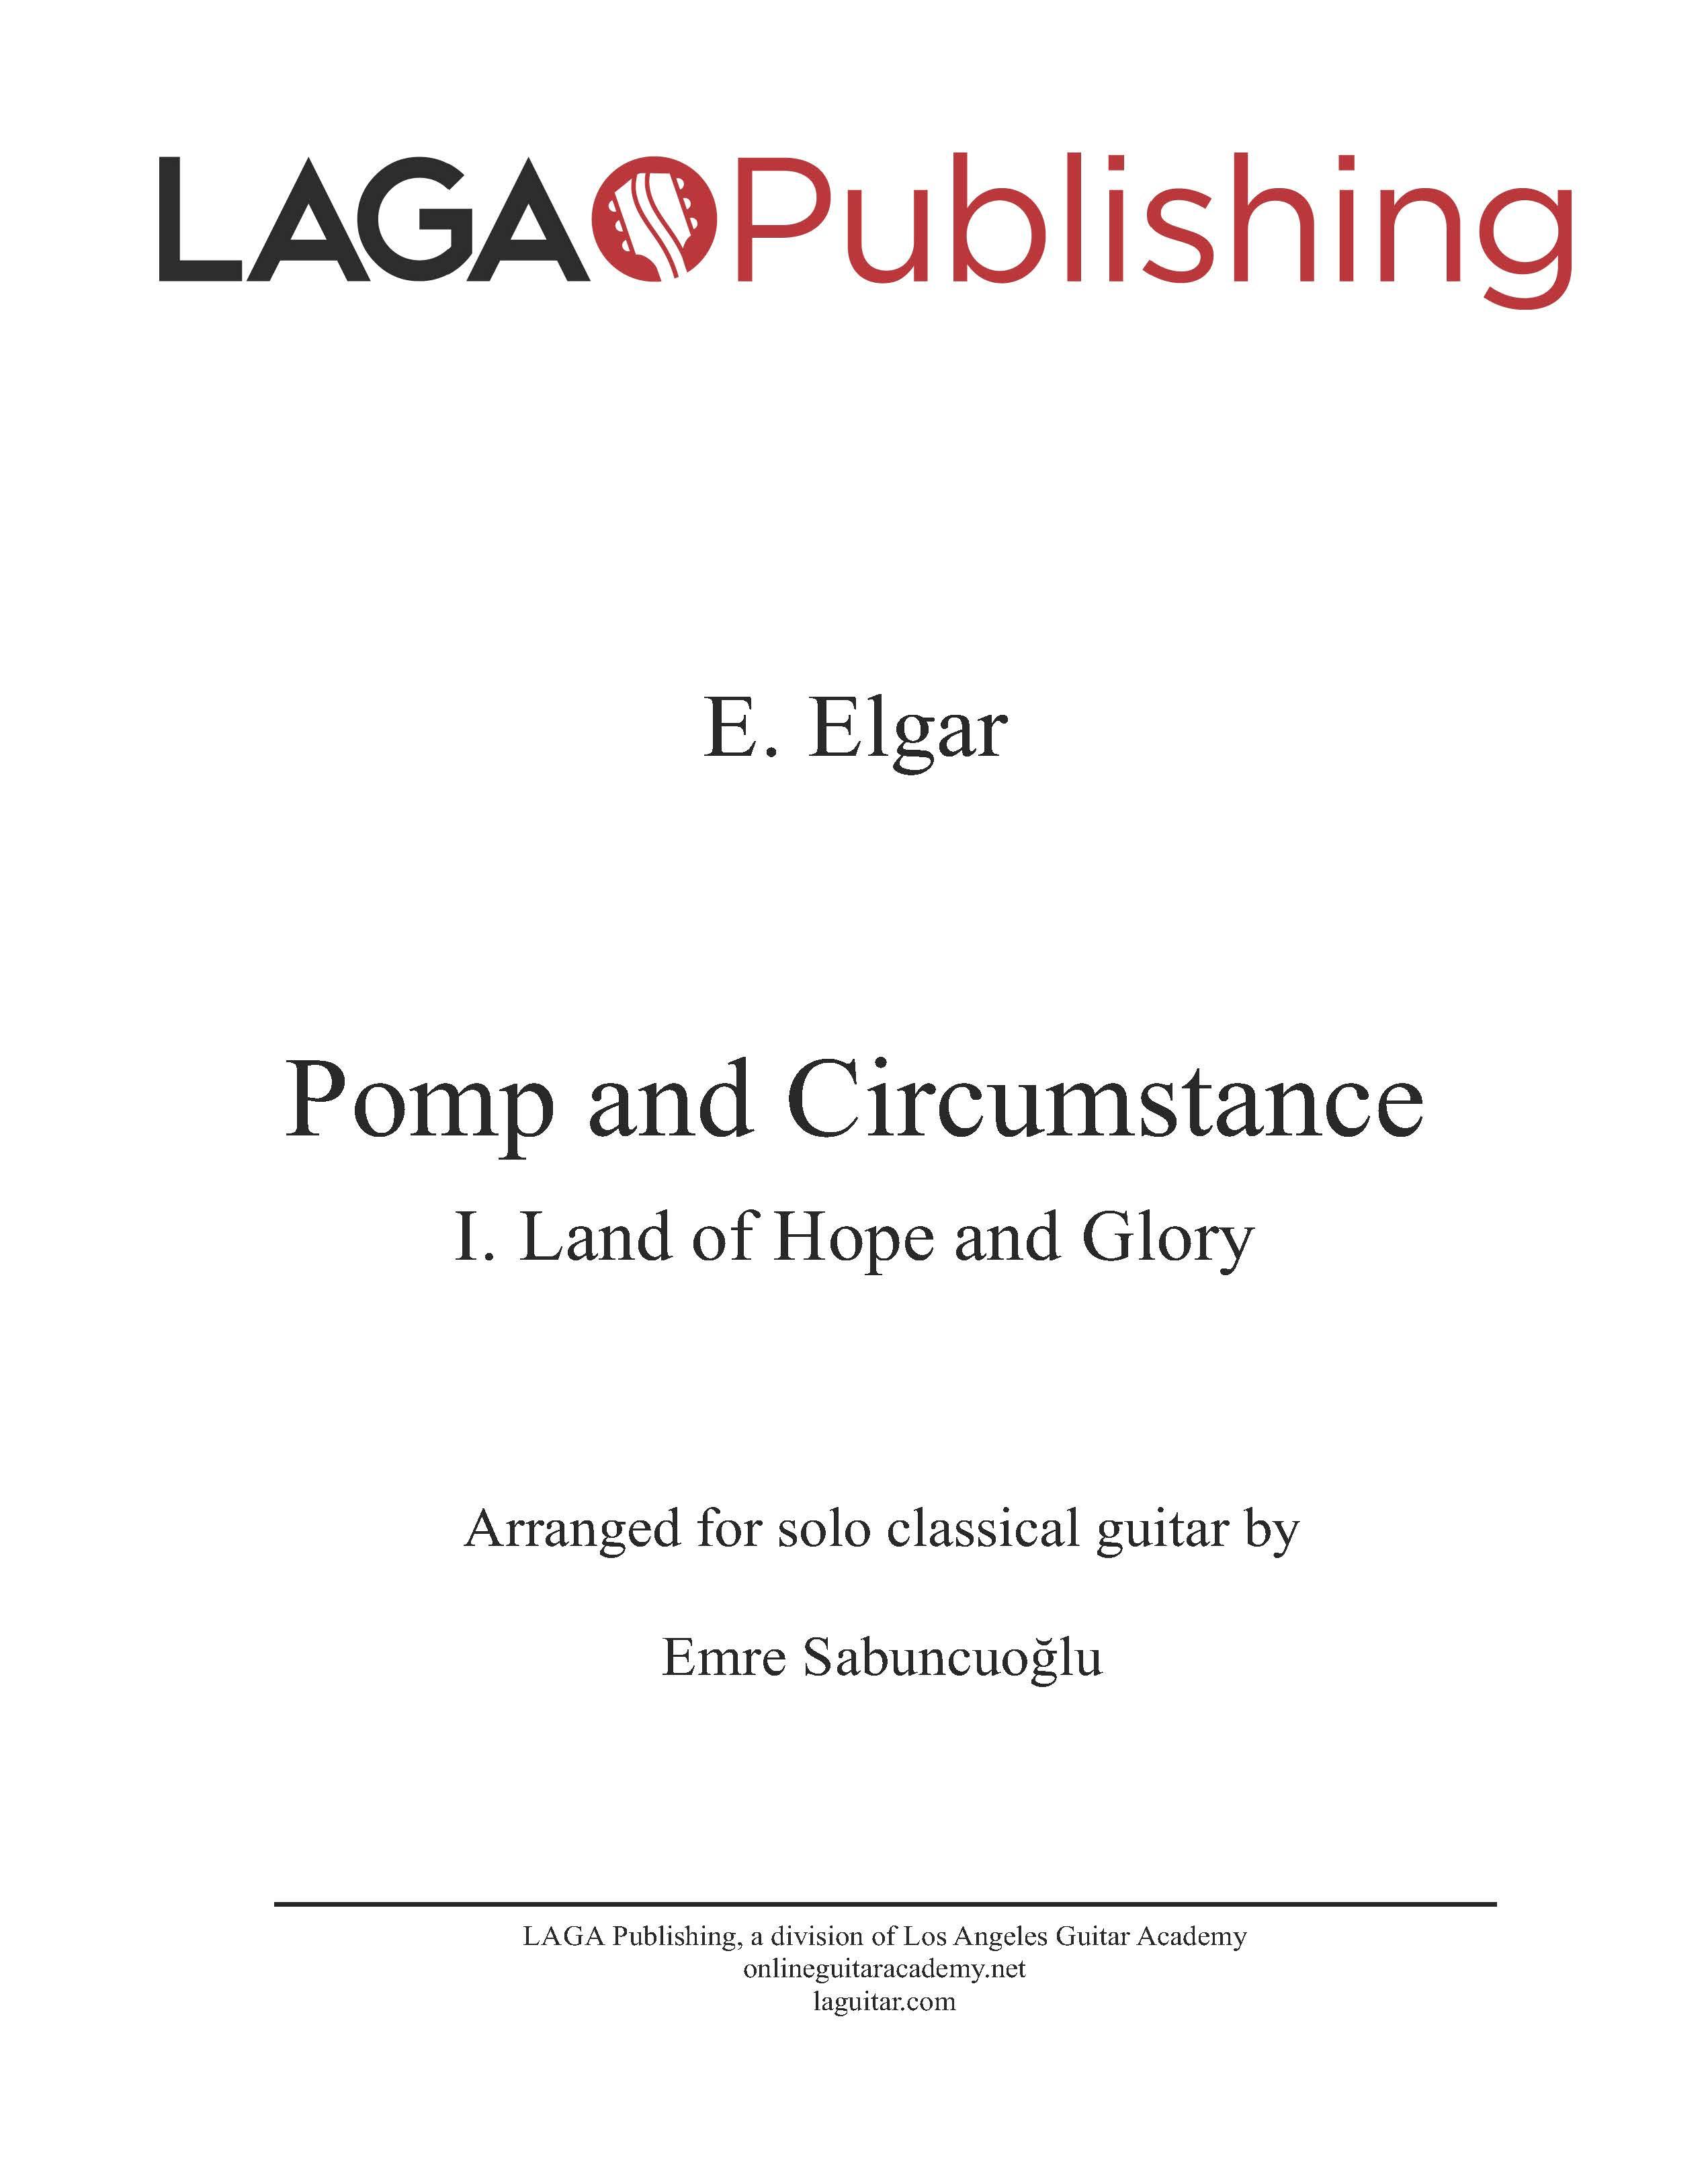 LAGA-Publishing-Elgar-Pomp-Circumstance-Score-and-Tab